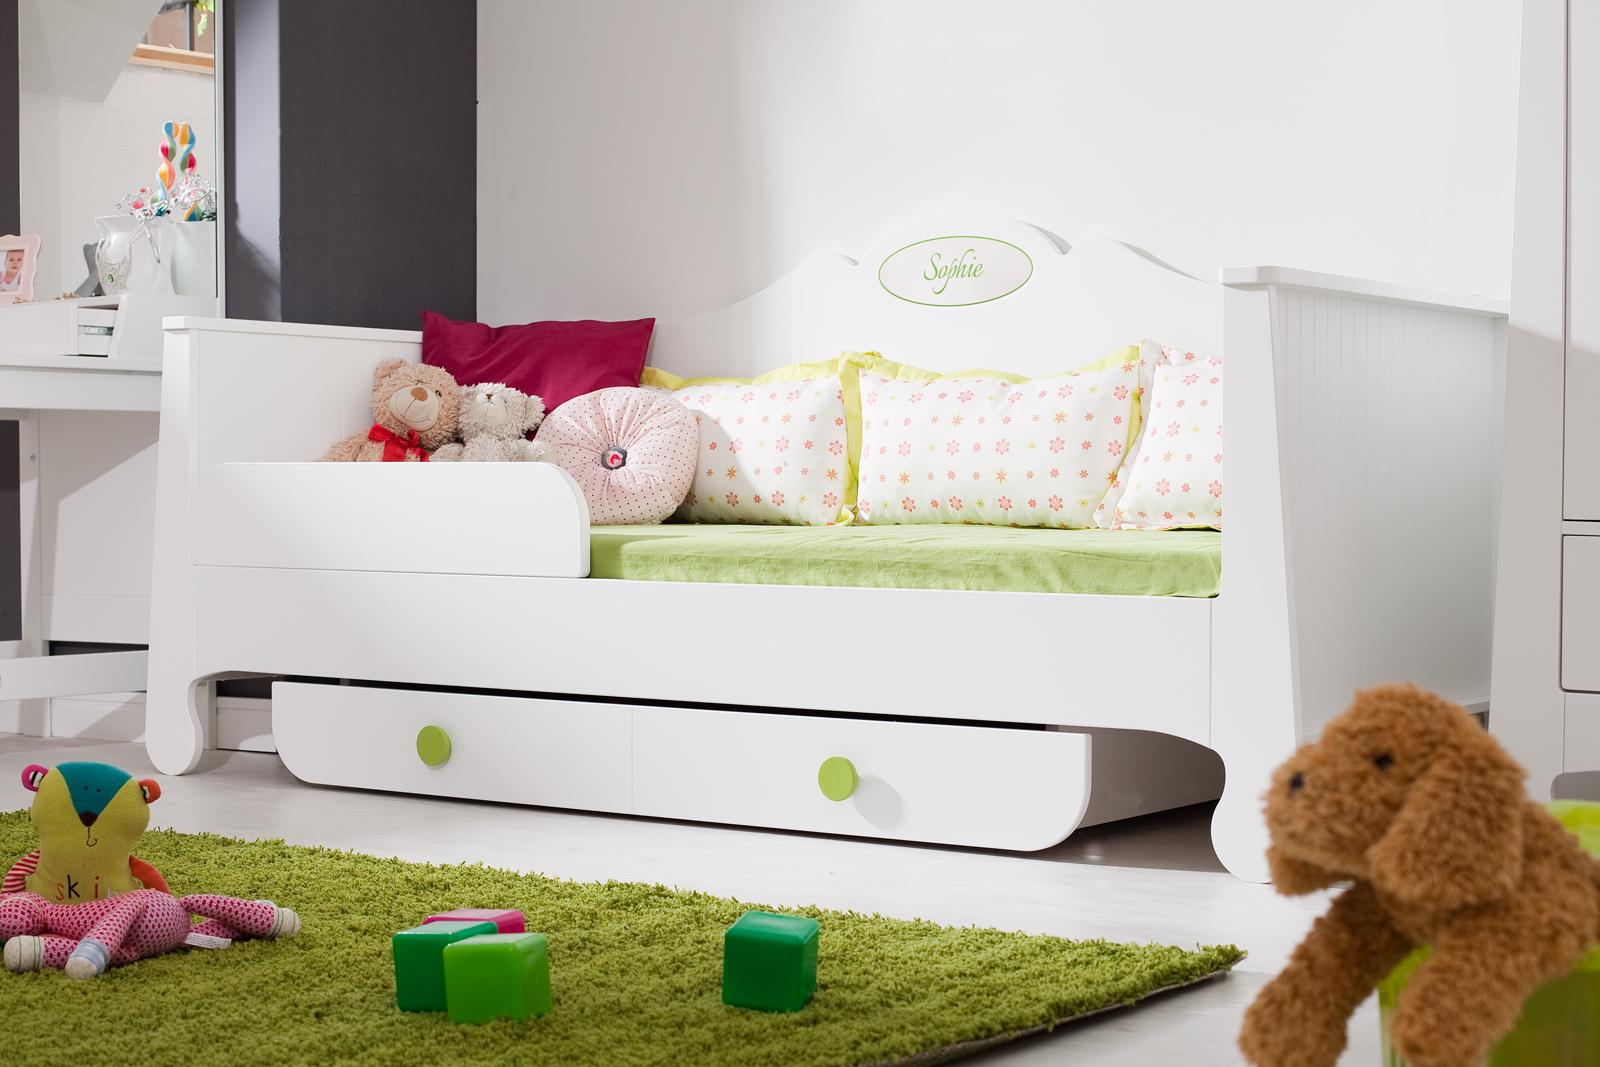 pinio parole fille 5 meubles lit 200x90 commode armoire biblioth que bureau baby mania. Black Bedroom Furniture Sets. Home Design Ideas